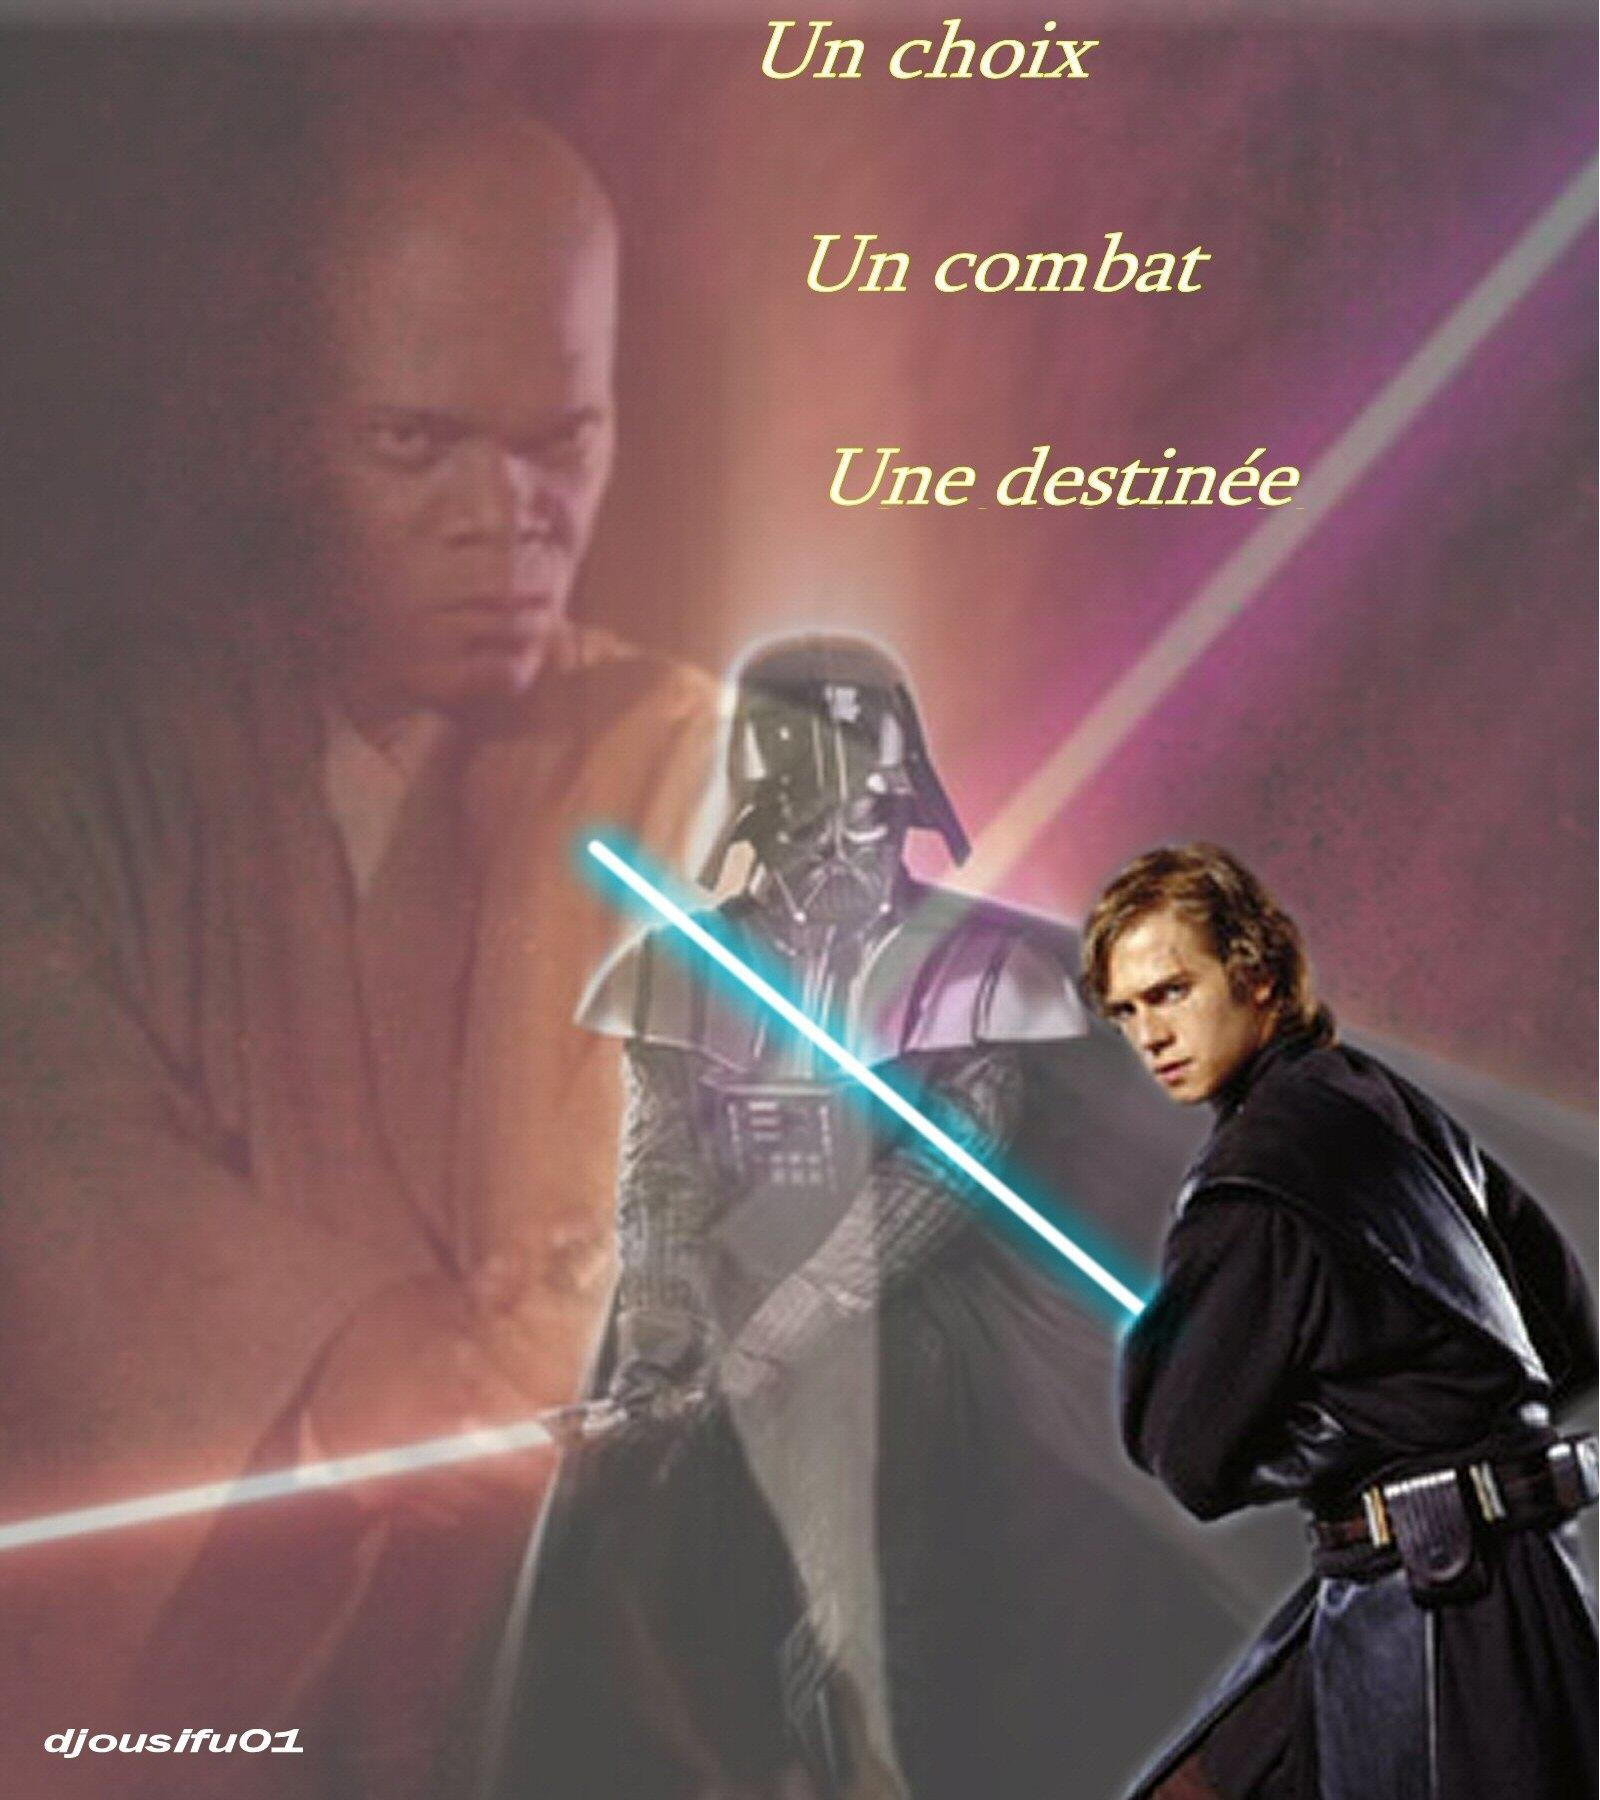 Photo 1 - [djousifu01] Combattre ou non Windu scellera la destinée d'Anakin...